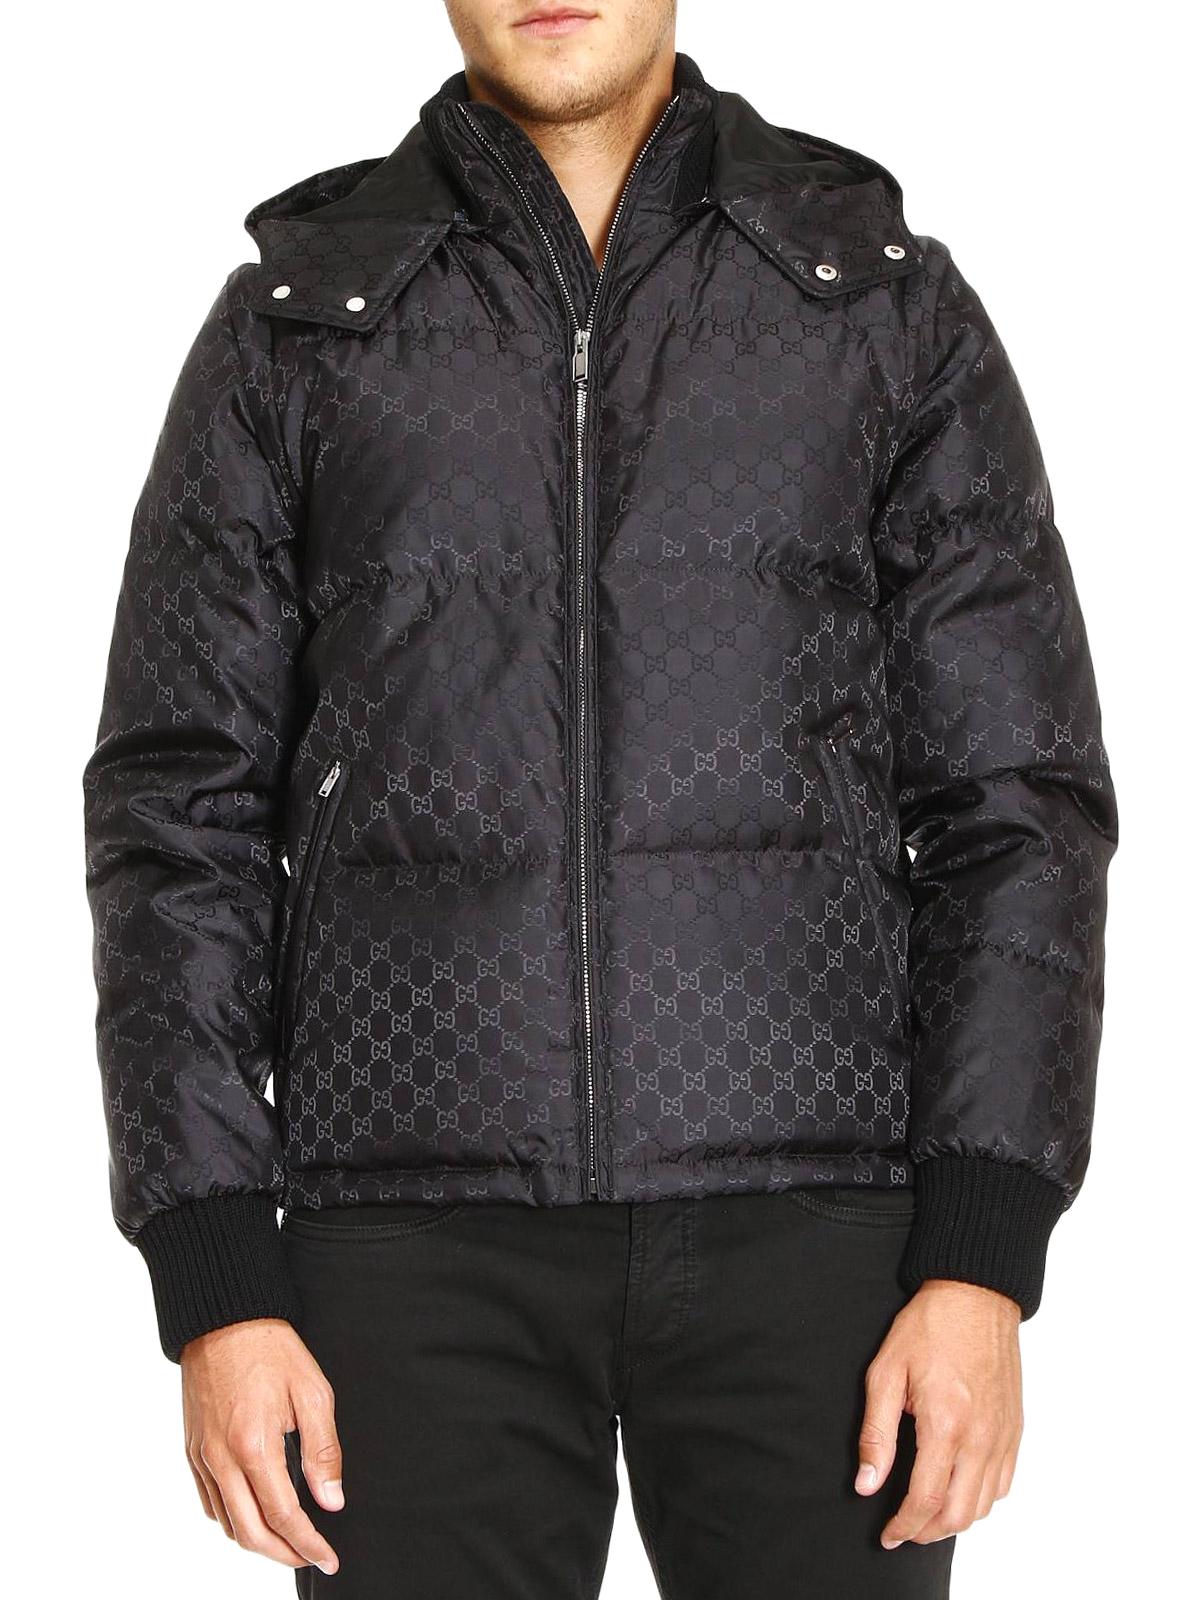 800bae1d4c Gucci - GG jacquard nylon puffer jacket - padded jackets - 473612 ...